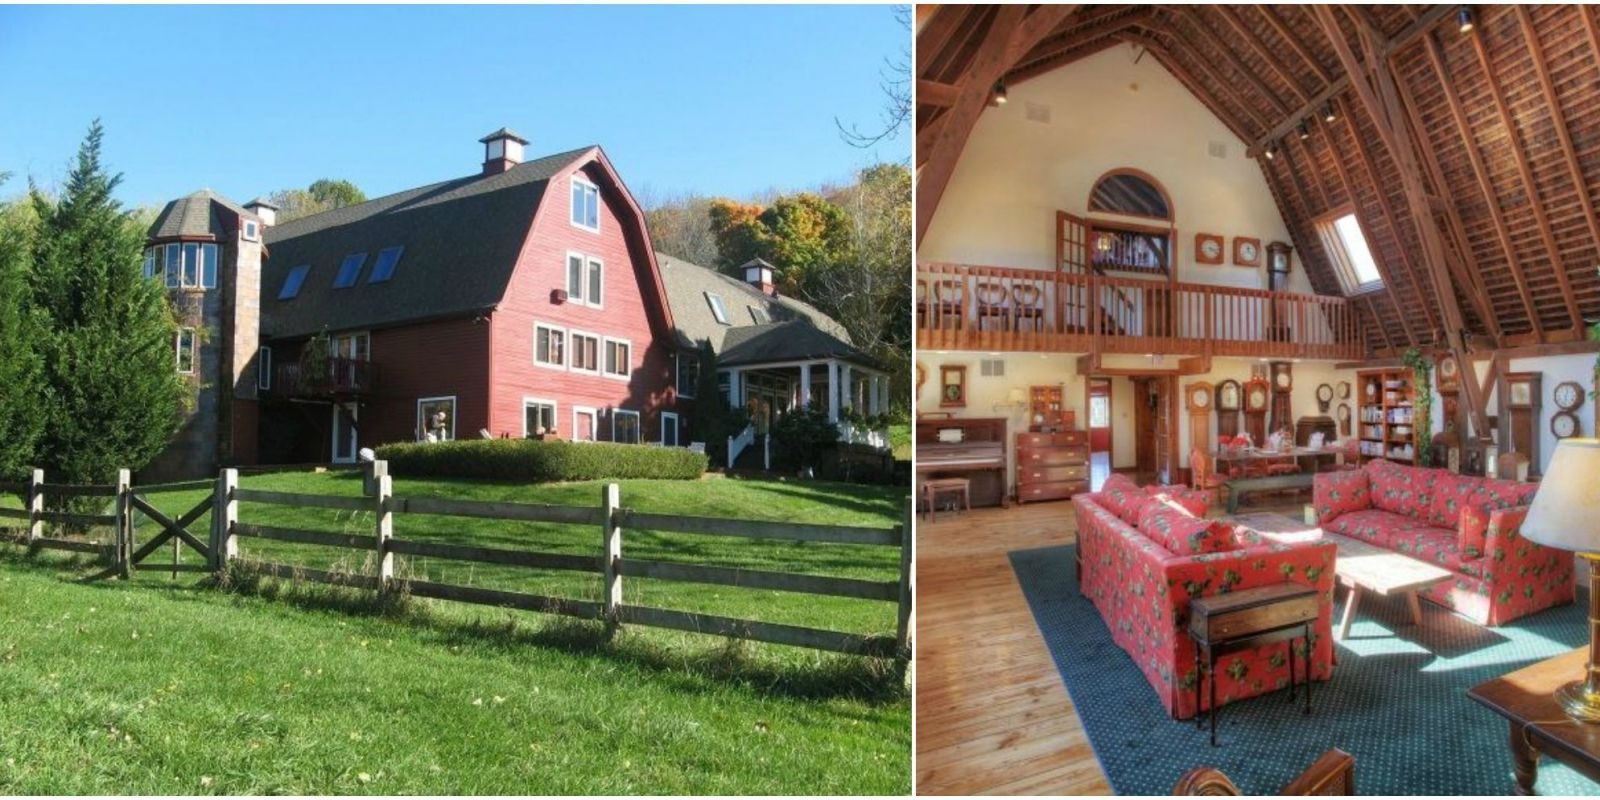 design living room furniture arrangements orange idea red barn home tour - converted from 1900